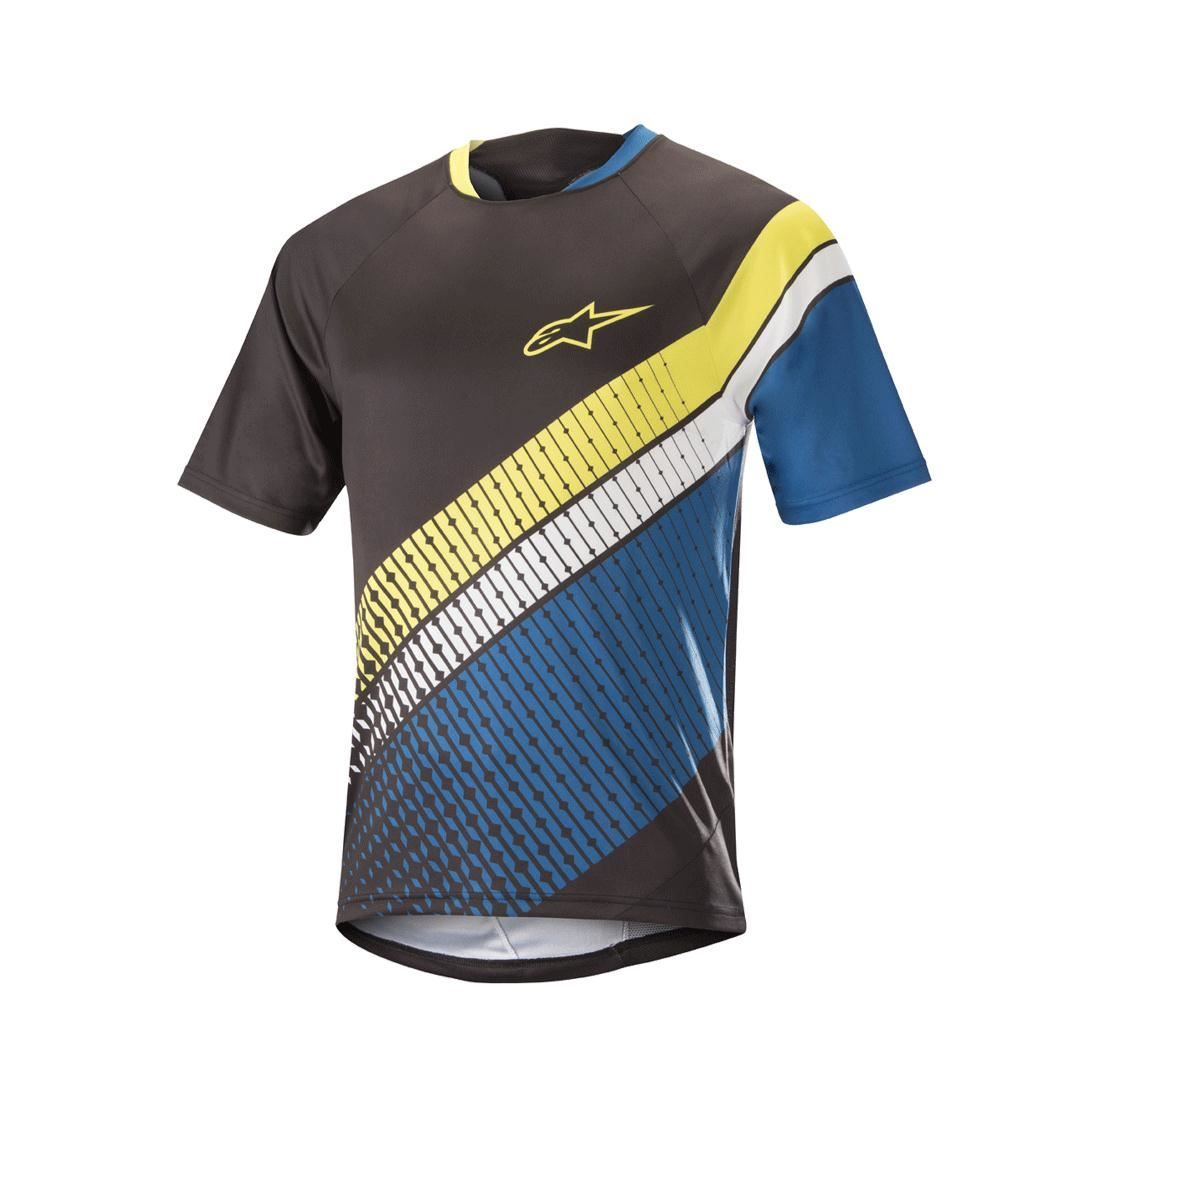 Alpinestars Predator Short Sleeve Jersey 2018: Black/Royal Blue/Acid Yellow M